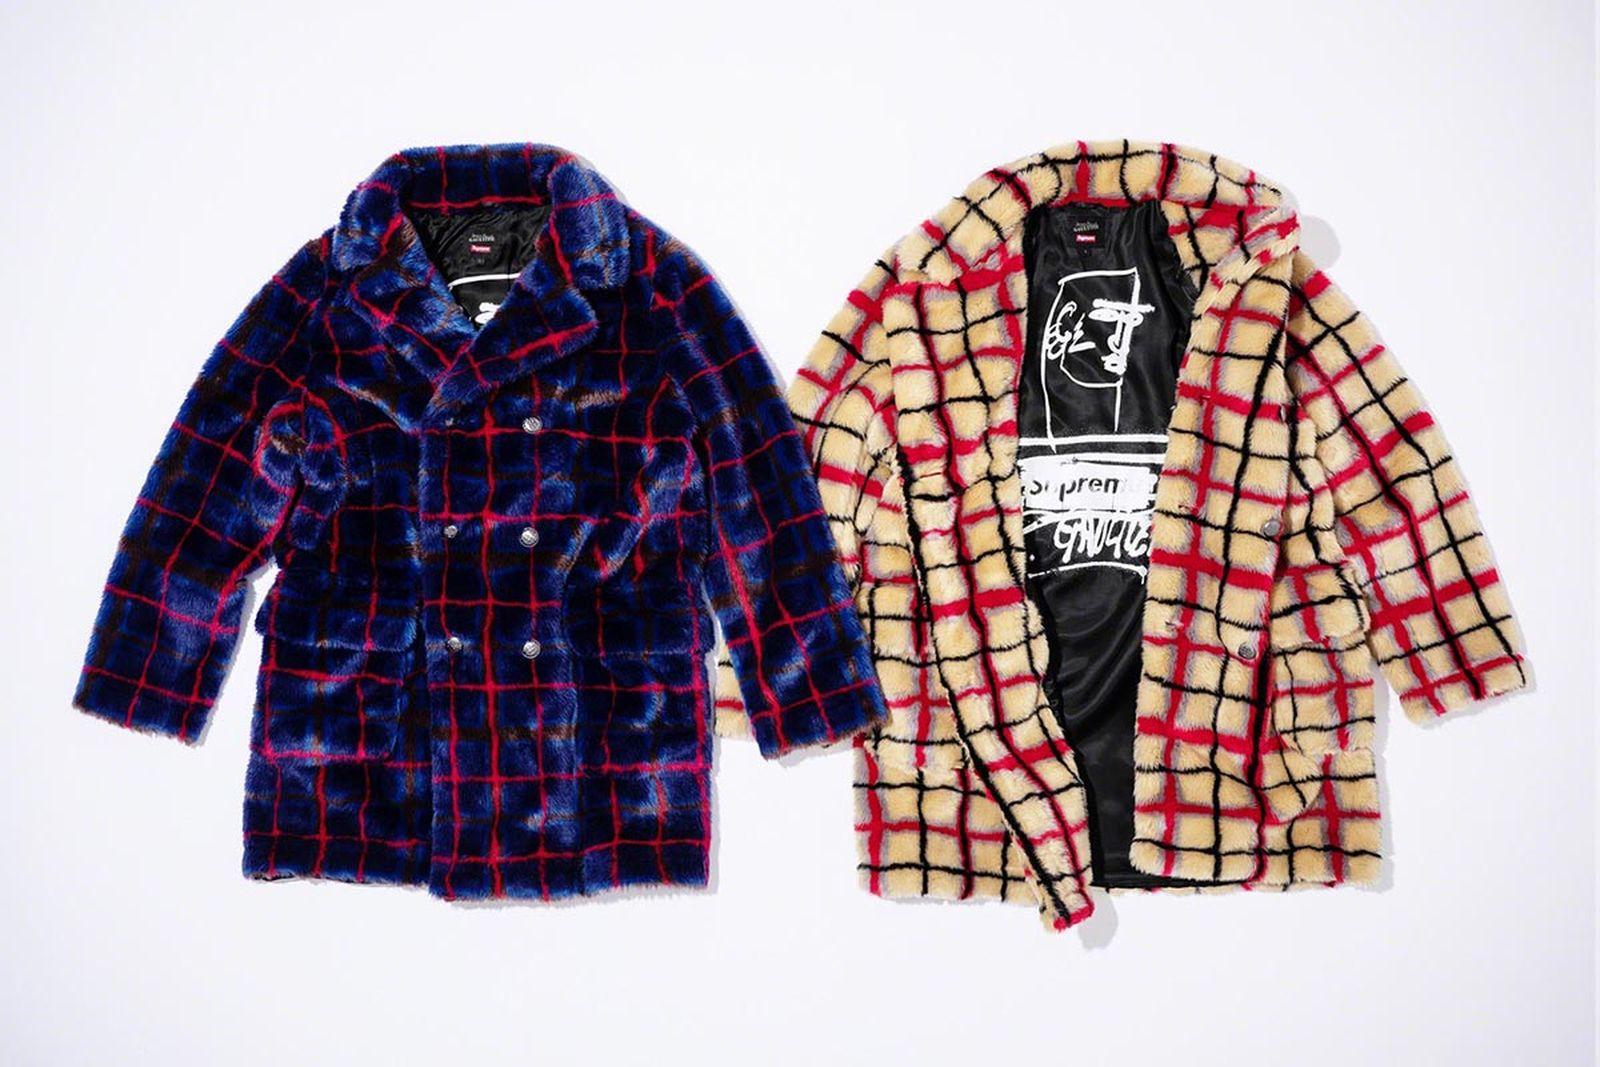 supreme jean paul gaultier collection jean-paul gaultier